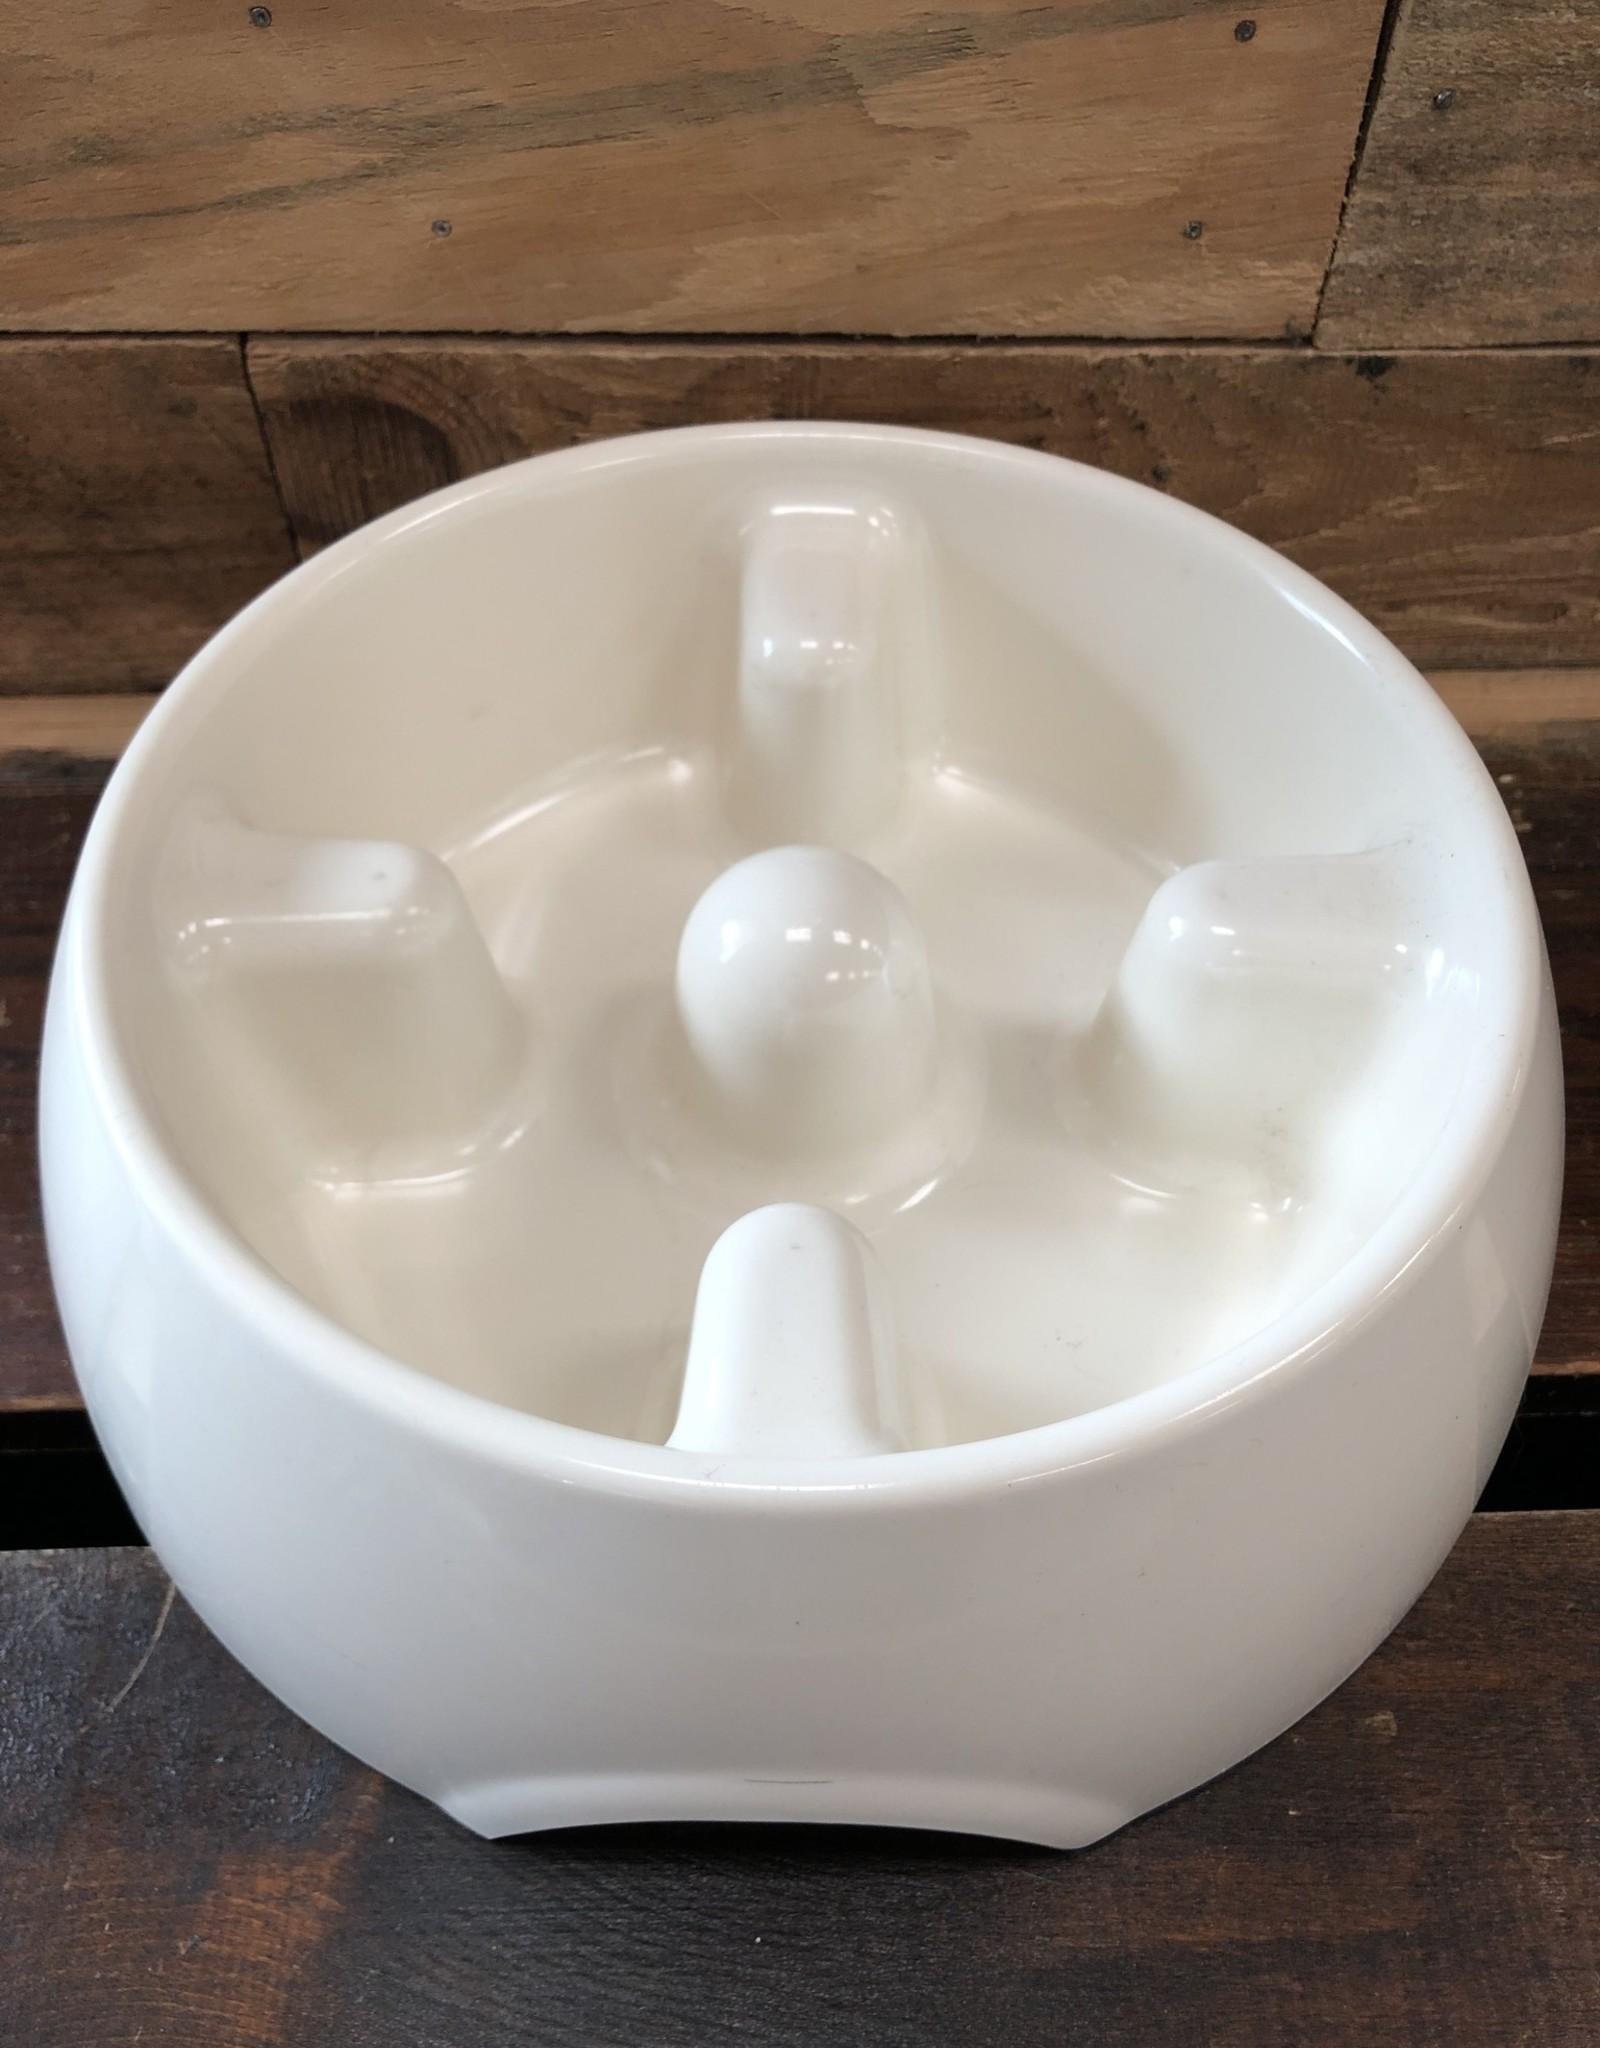 Hagen Dogit Go Slow Anti-Gulping Bowl, White Large